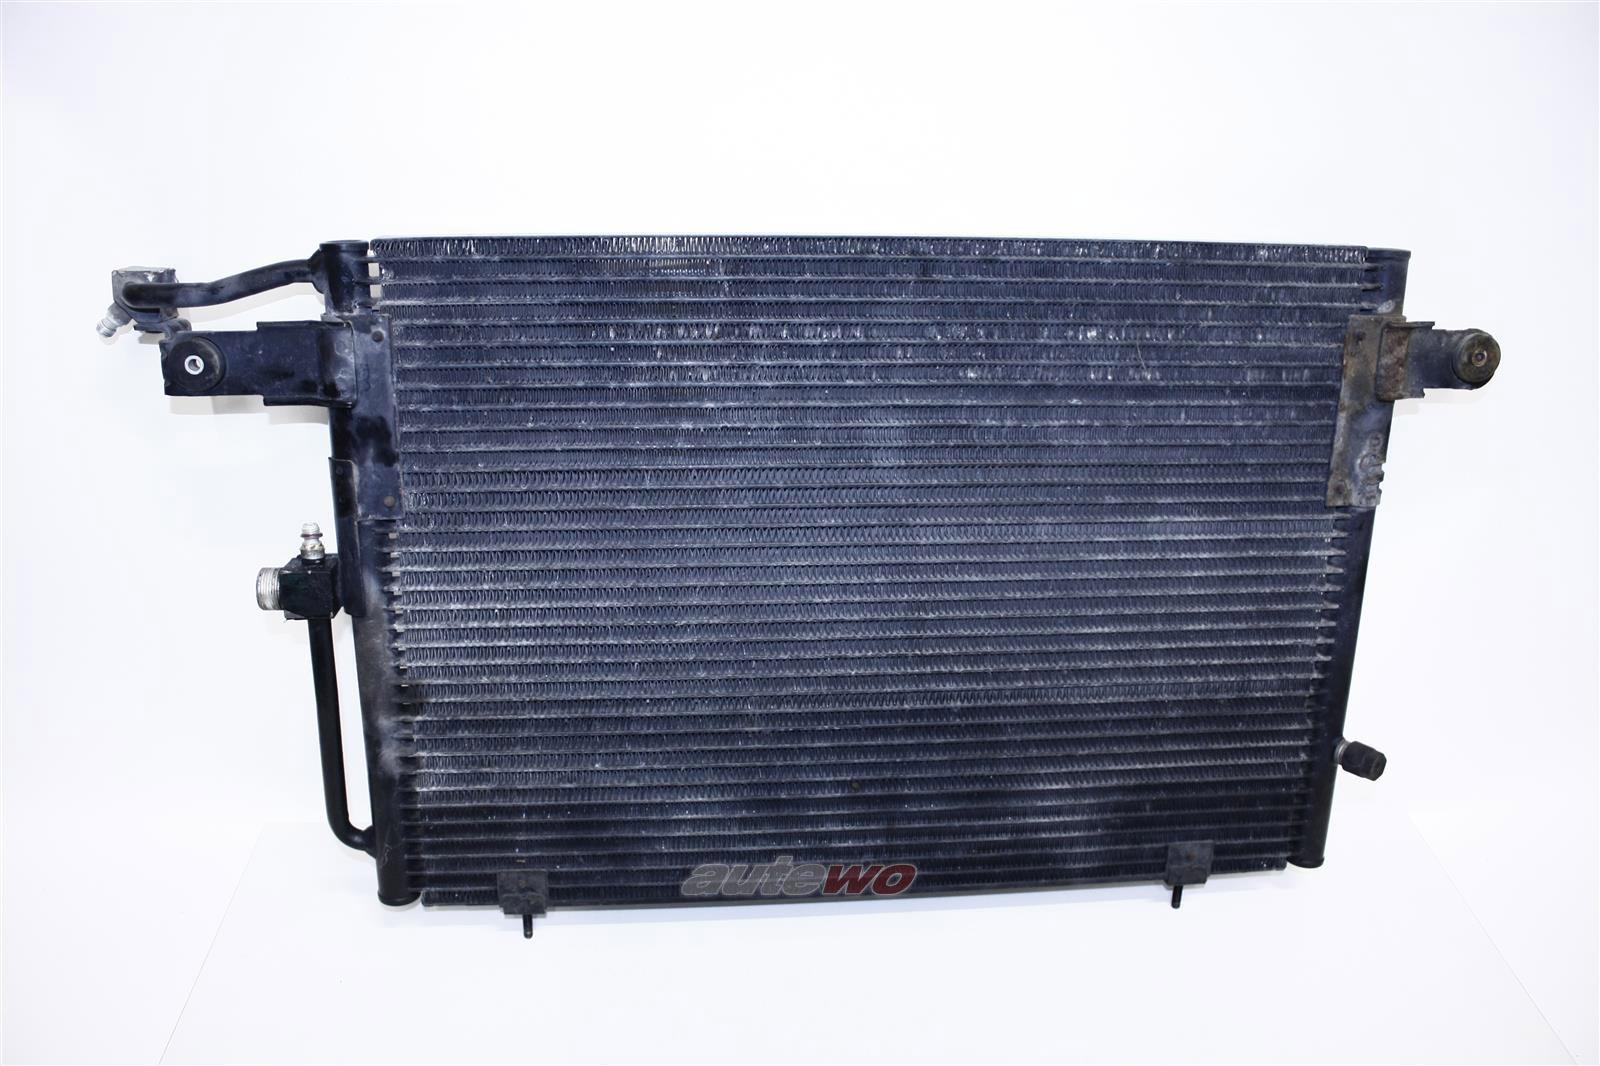 Audi 100/S4/A6/S6 C4 Klima Kondensator Kältemittel R134A 4A0260403AC 4A0260401AC